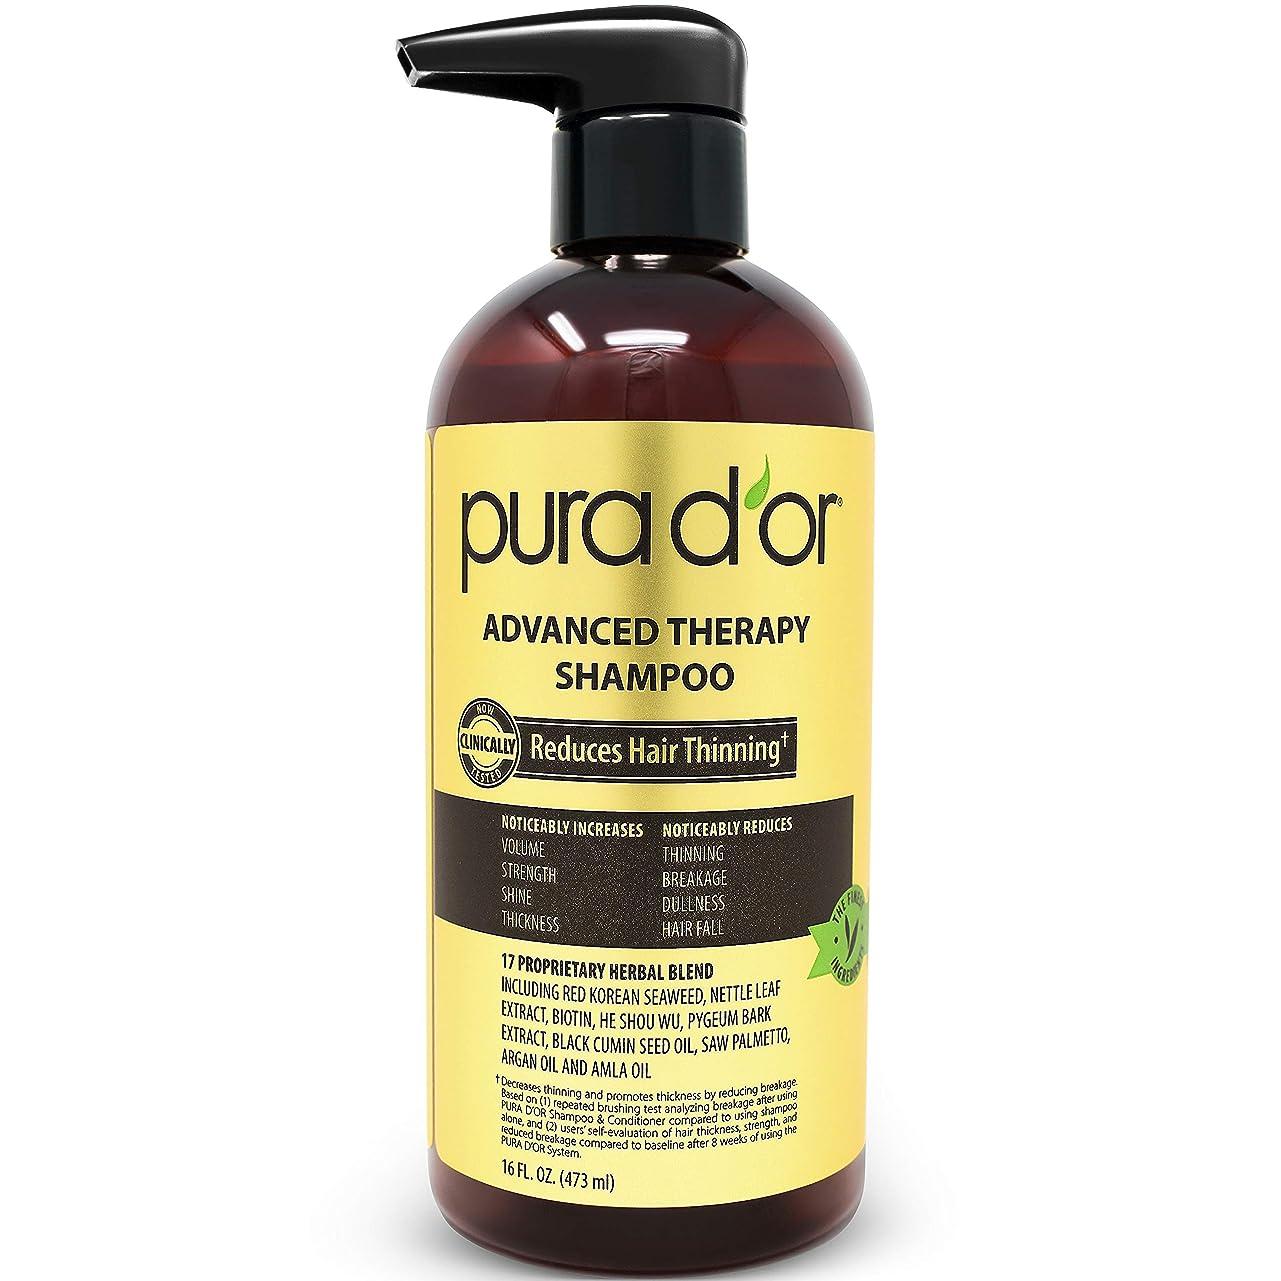 PURA D'OR 高度セラピーシャンプー 薄毛を改善し、髪にボリュームを、硫酸塩フリー、アルガンオイル&アロエベラ&ビオチン配合、すべてのヘアタイプに、男性&女性、473ml(16液量オンス) 473ml(16 液量オンス)